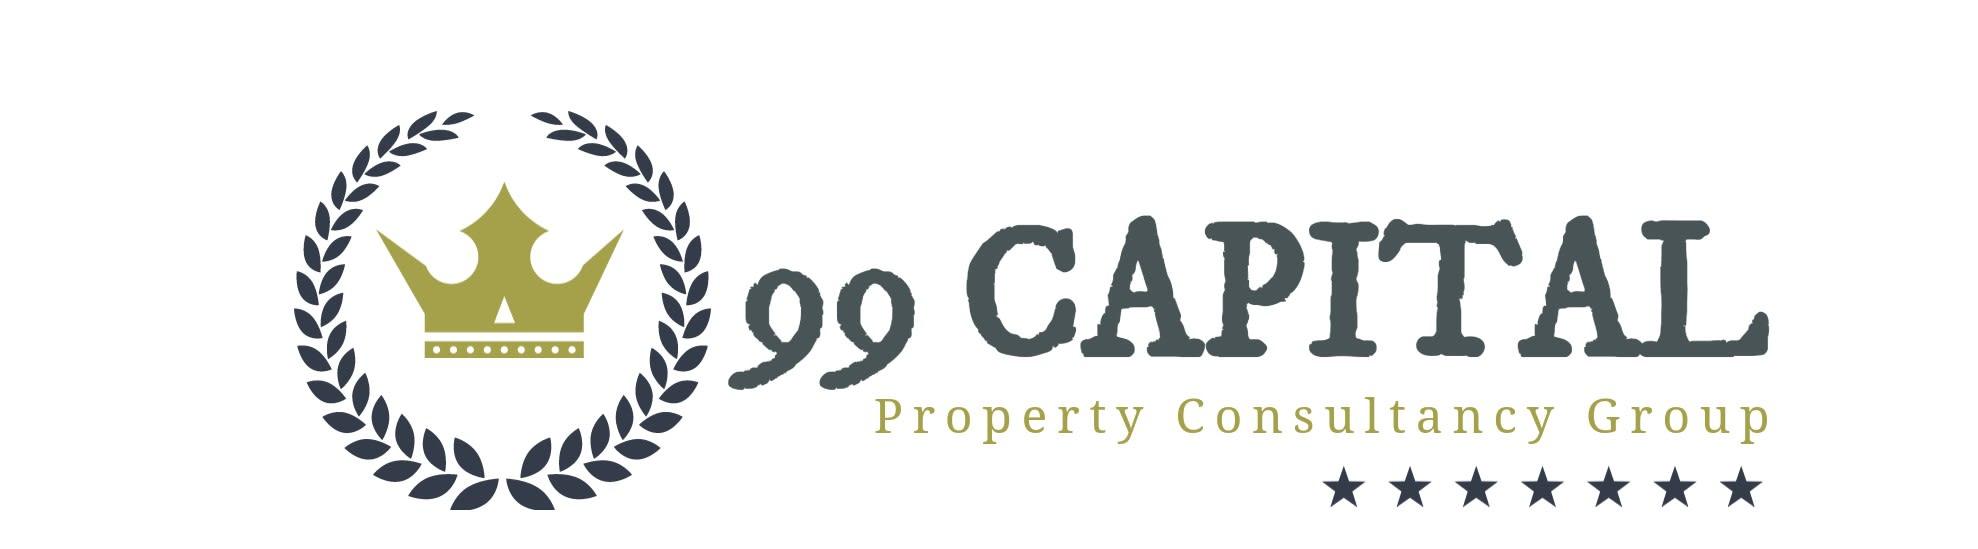 99 Capital